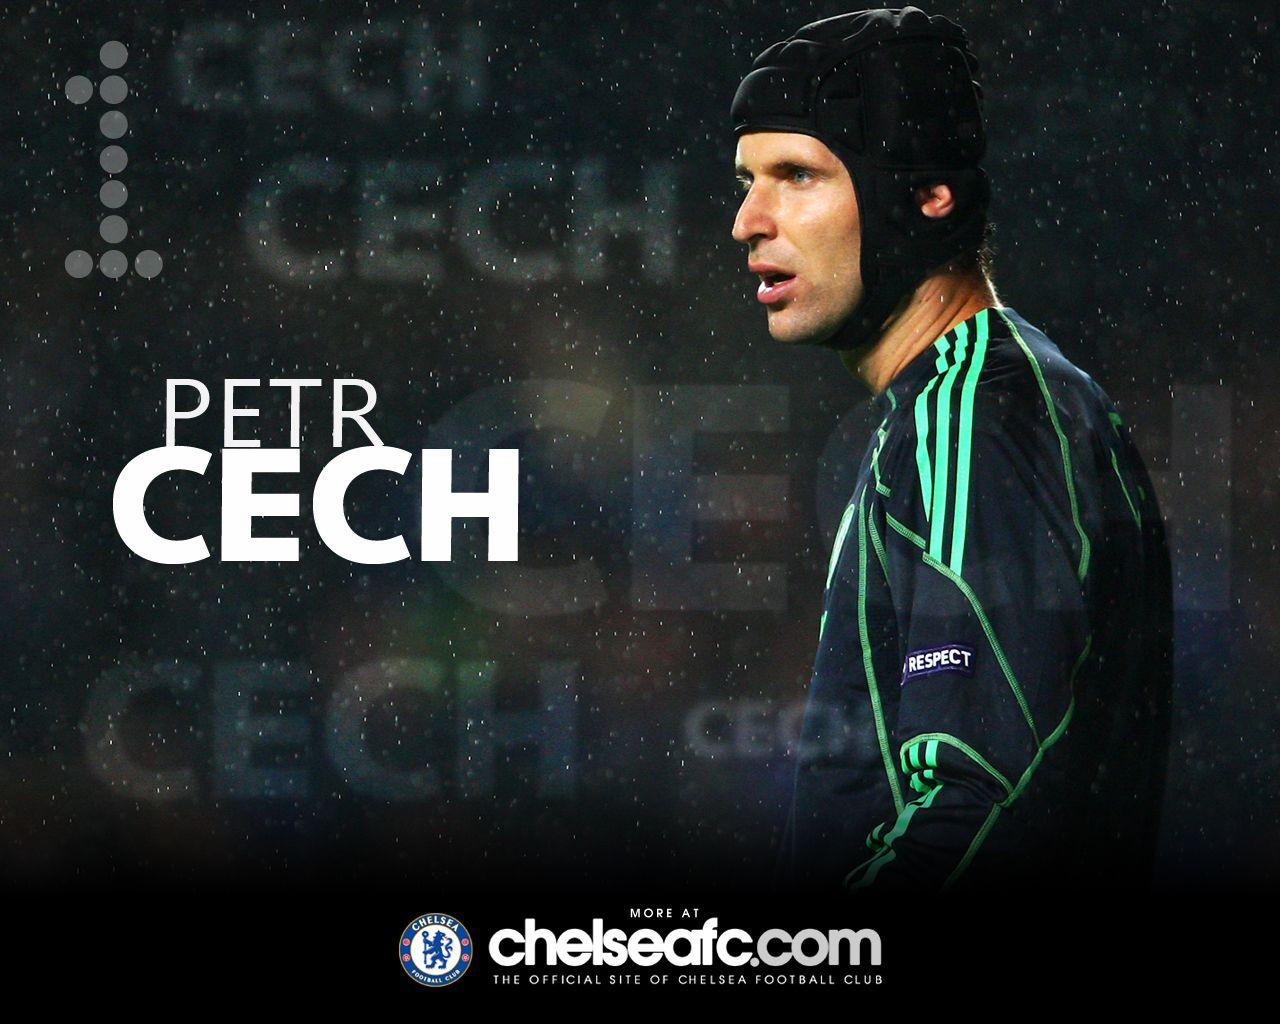 Football Player's Biography 7: Petr Čech